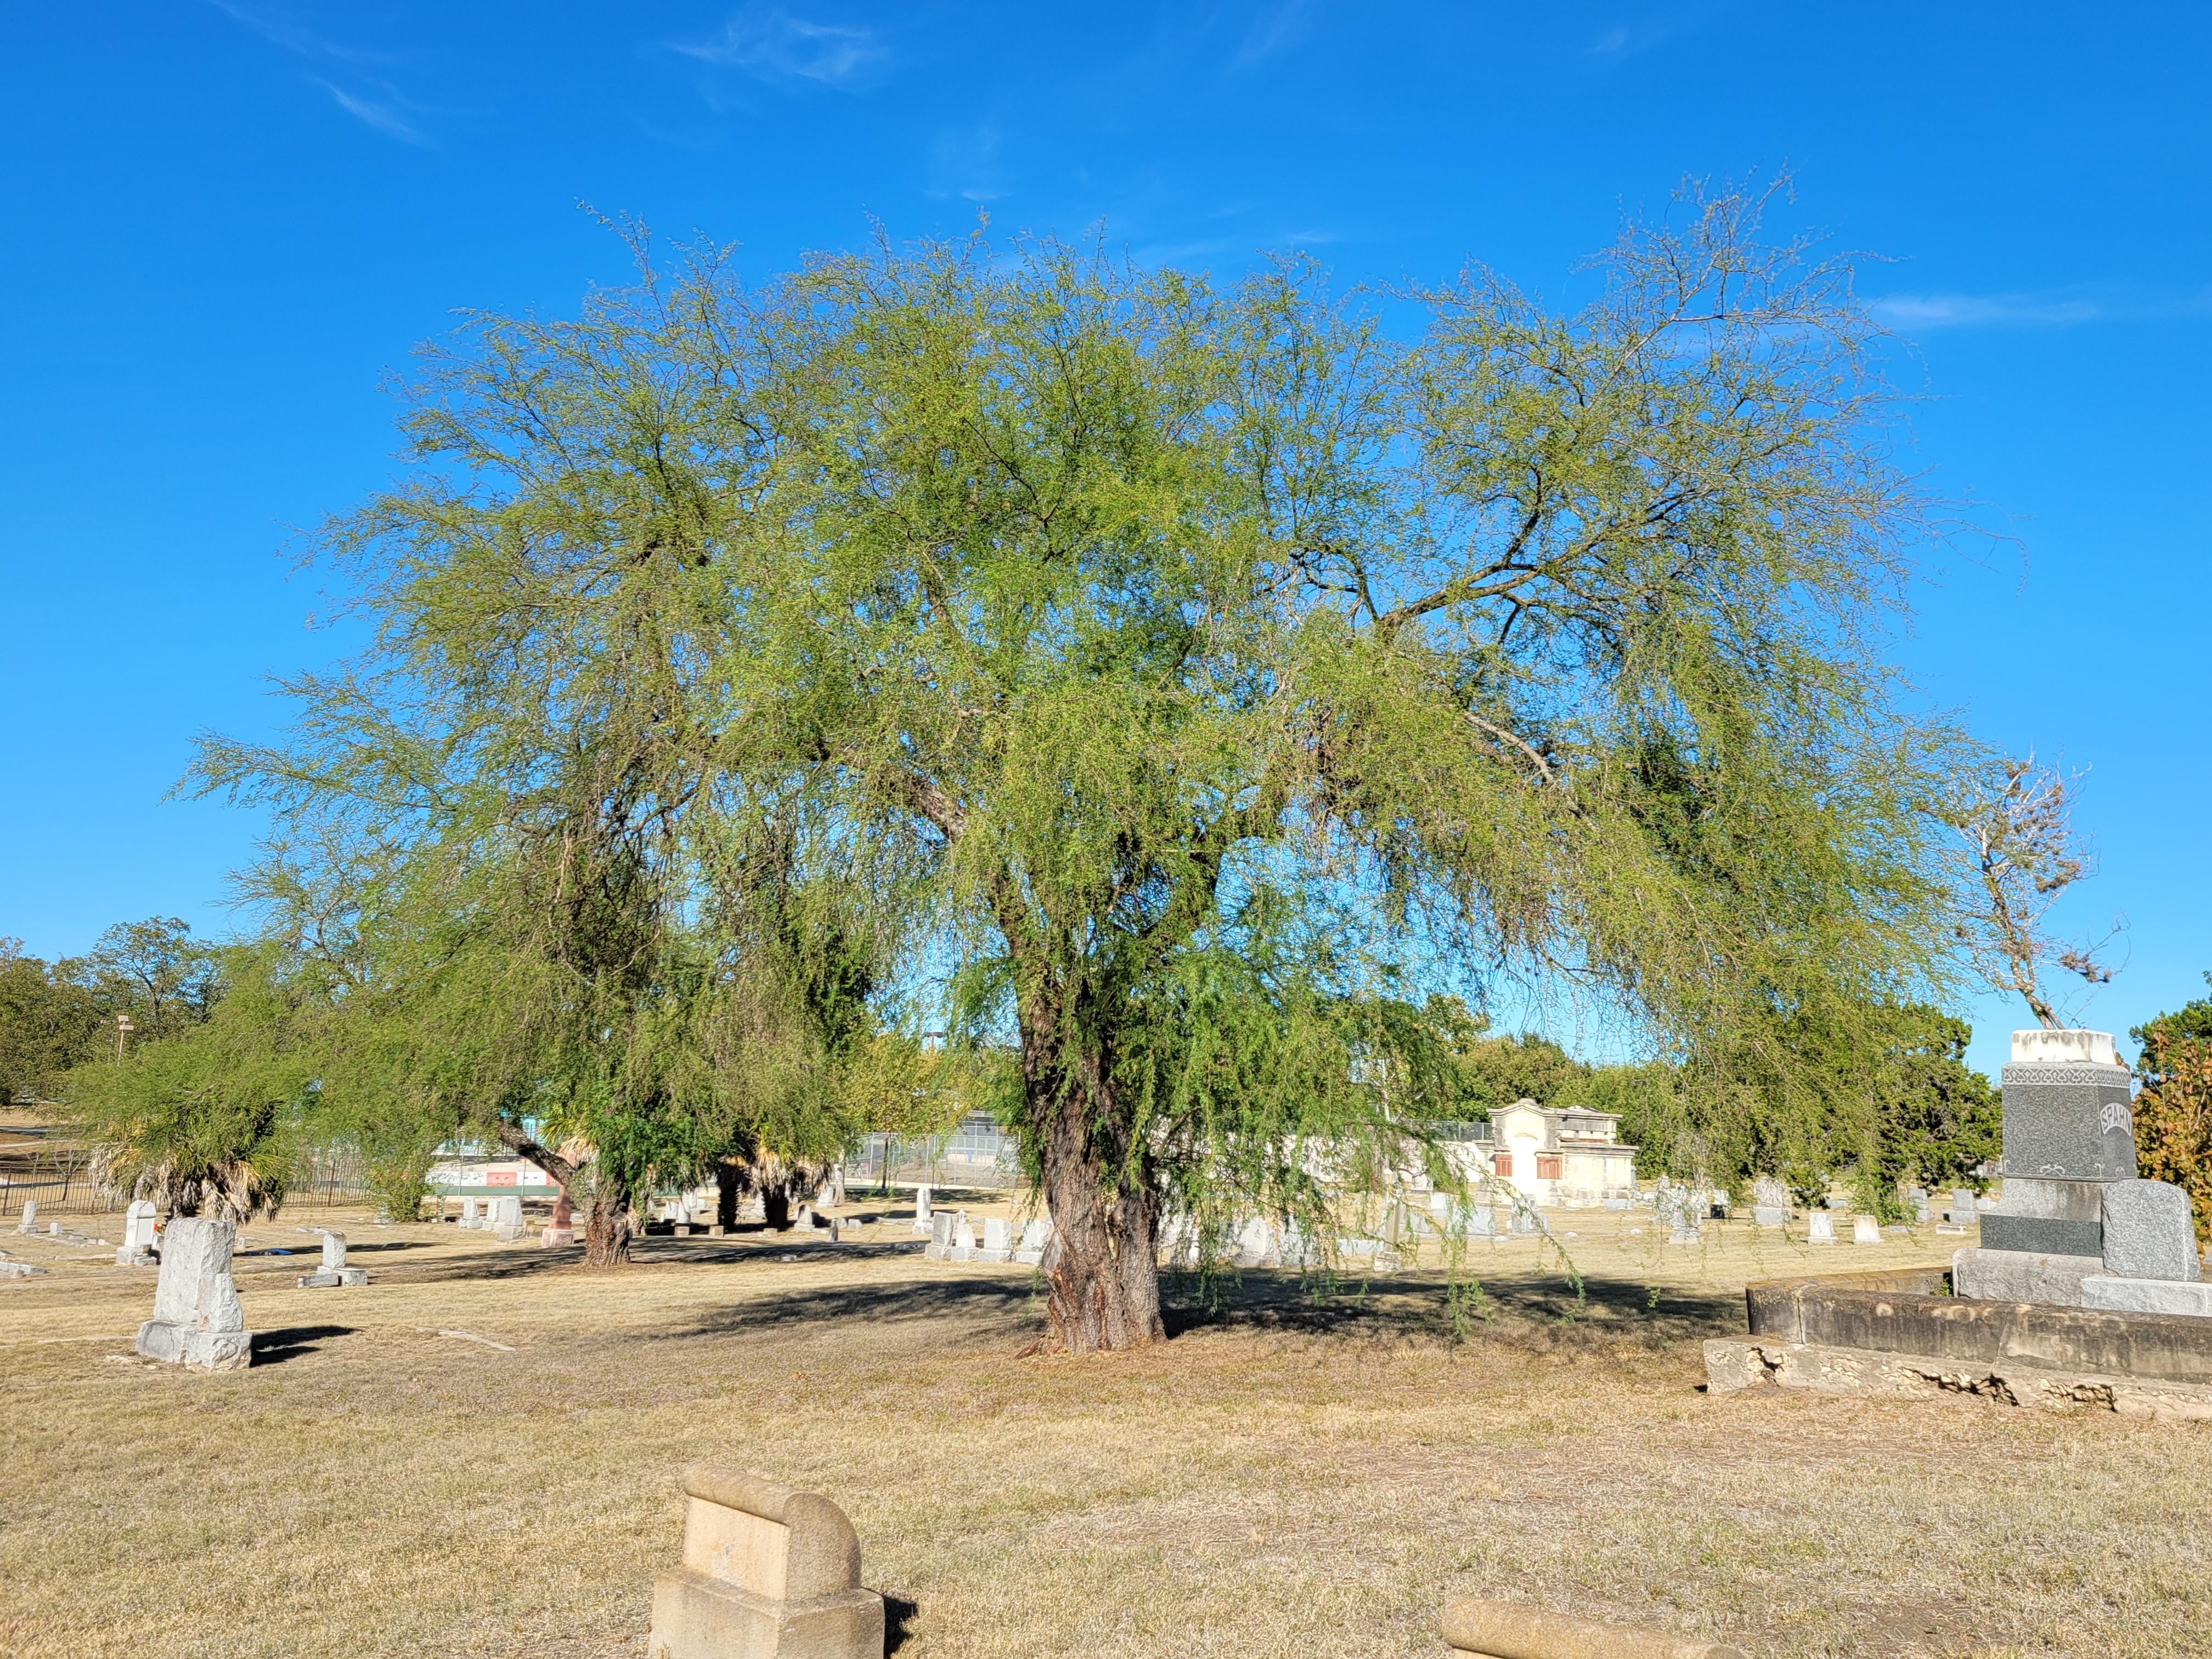 Huisache tree in Alamo Defenders Cemetery in San Antonio, Texas